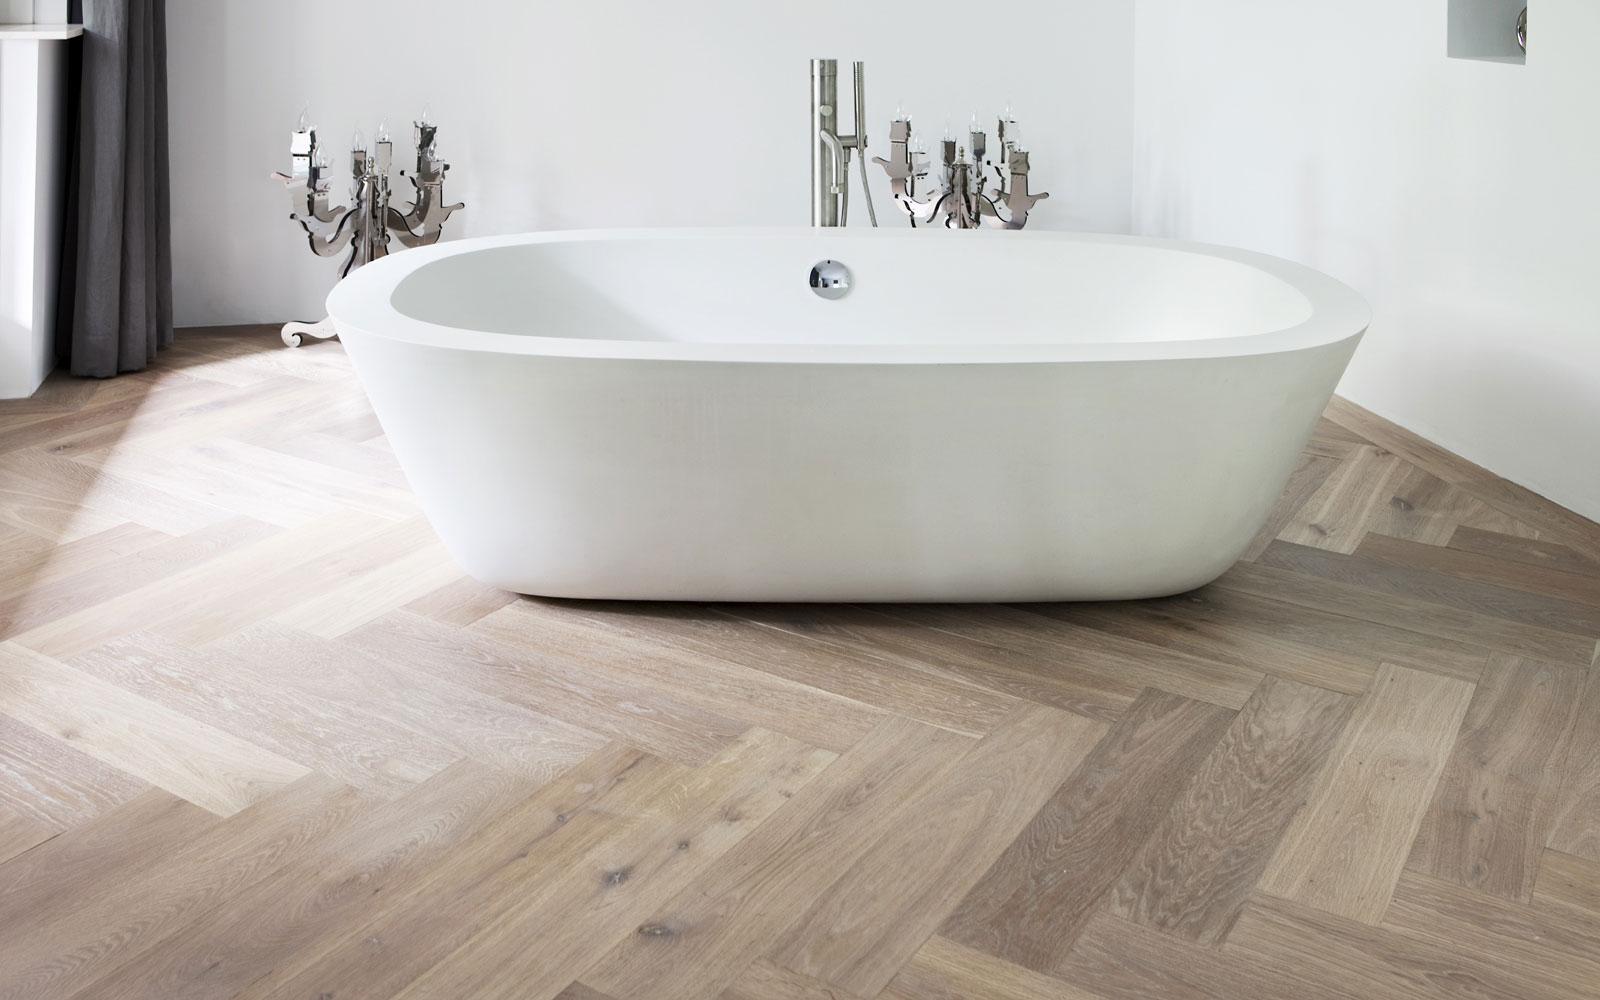 Houtlook tegels woonkamer en badkamer portugese tegels tegelaer - Badkamer keramische ...